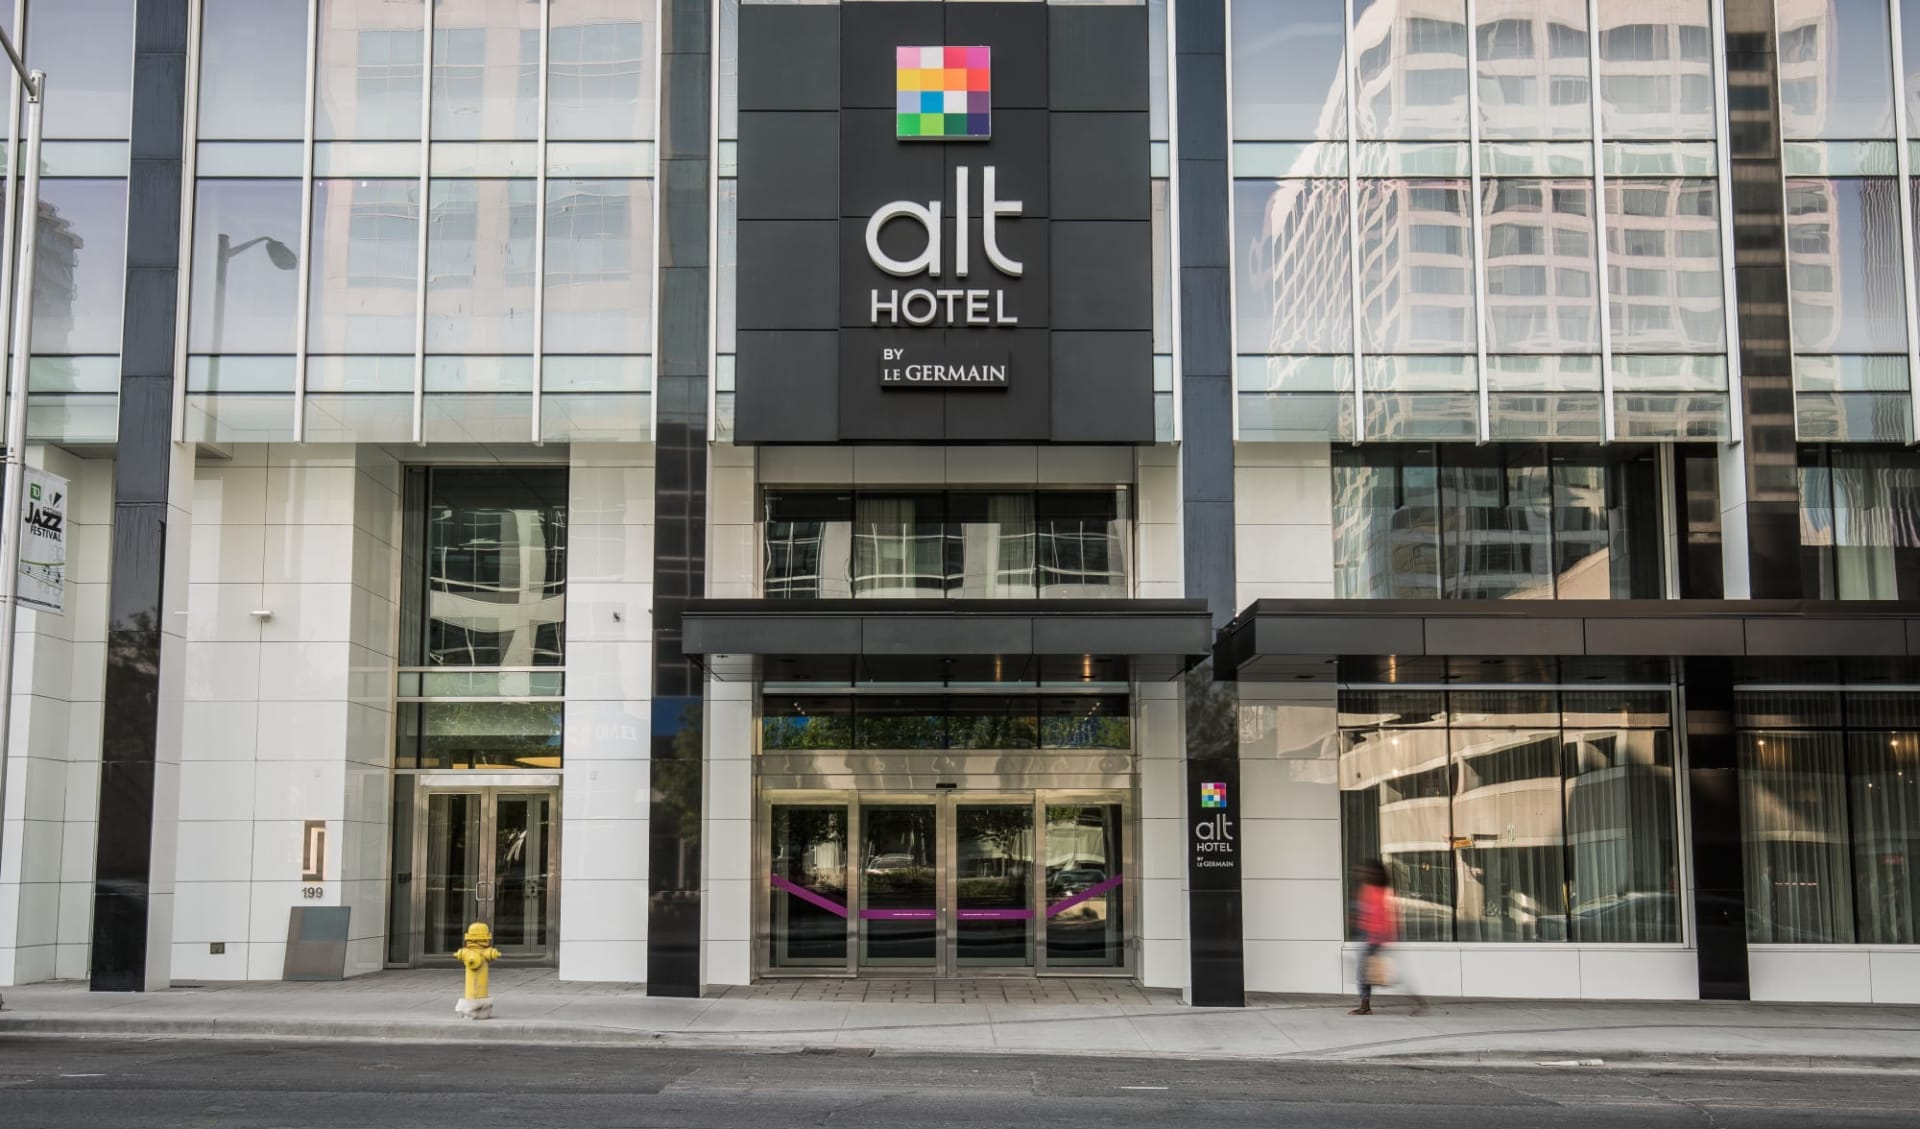 Alt Hotel Ottawa:  ALT Hotel Ottawa_Aussenansicht_Canadvac